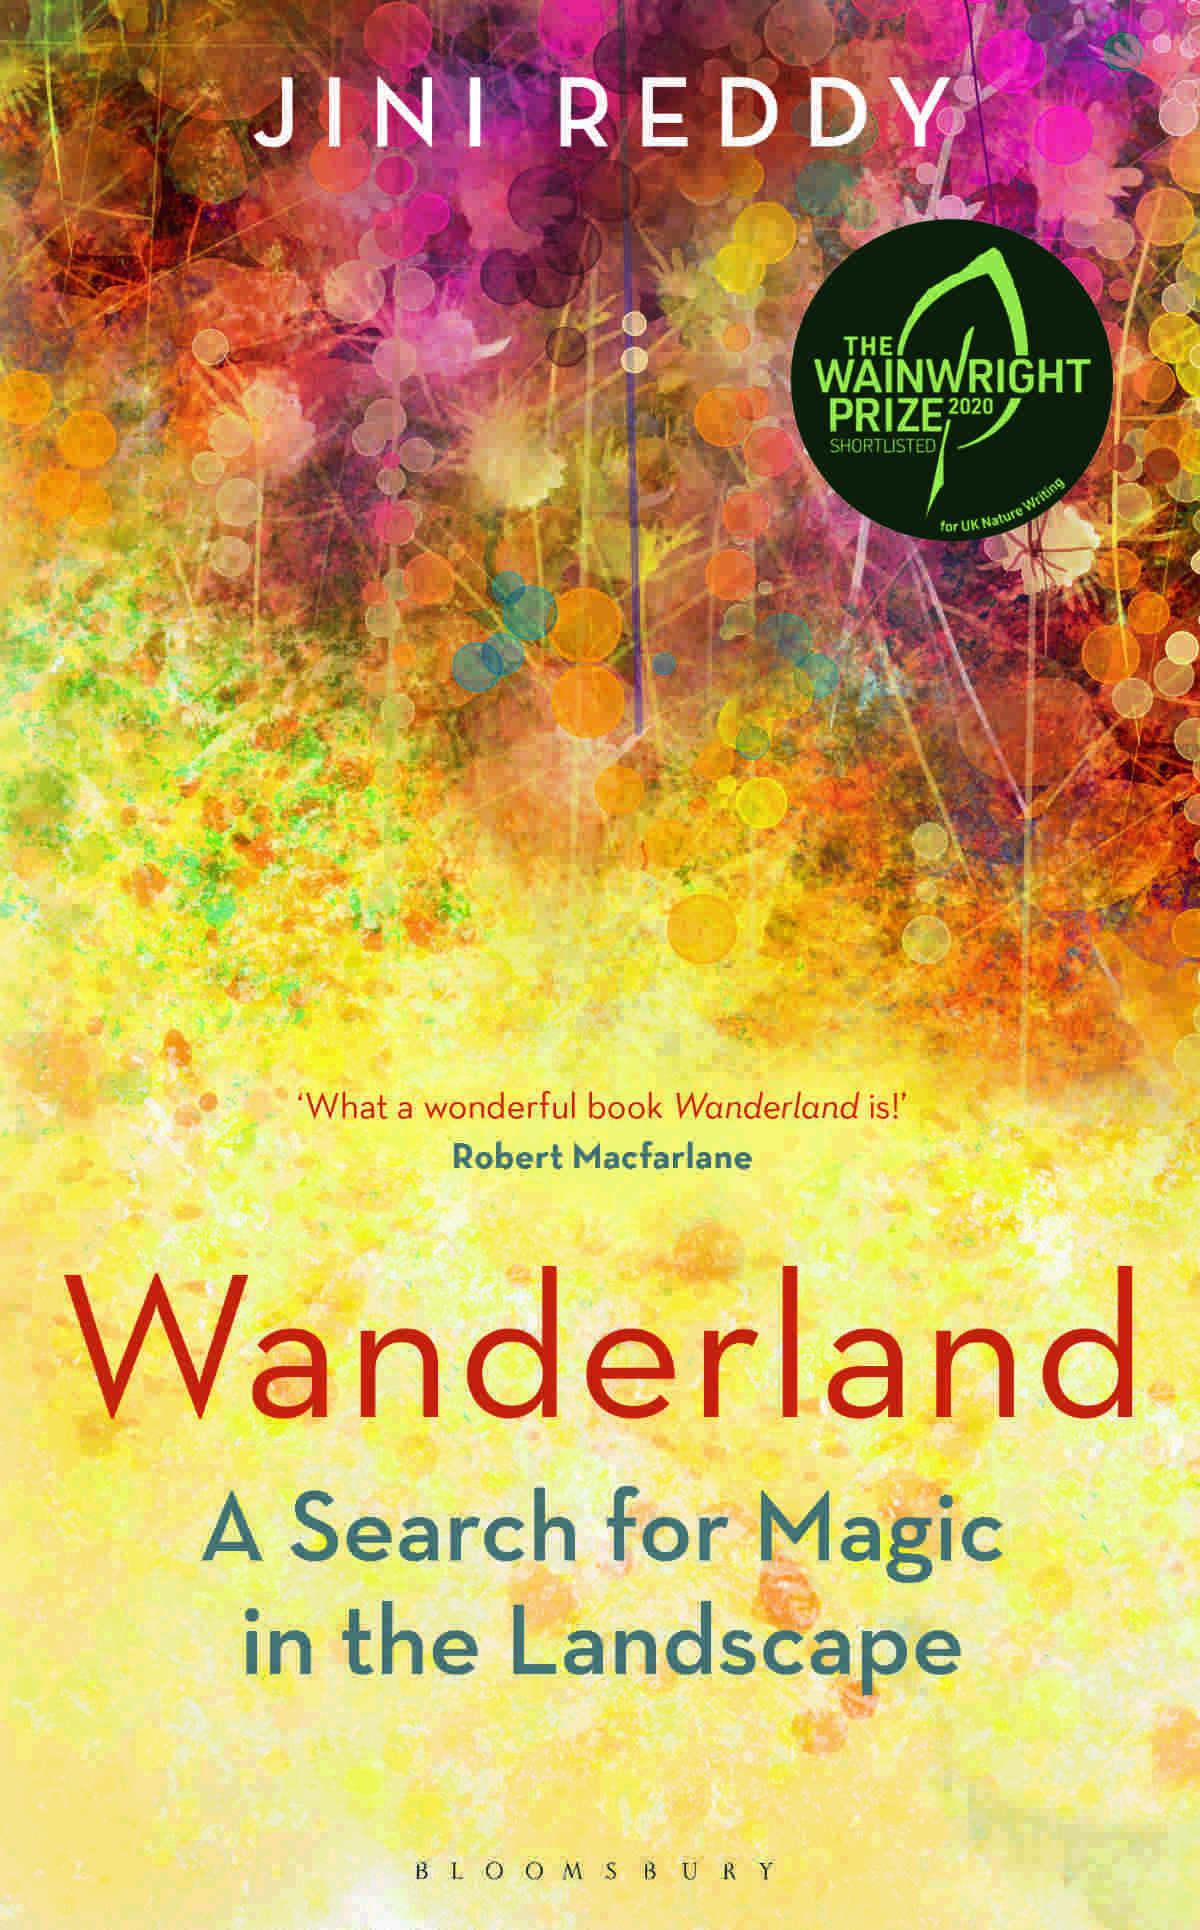 Wanderland book cover